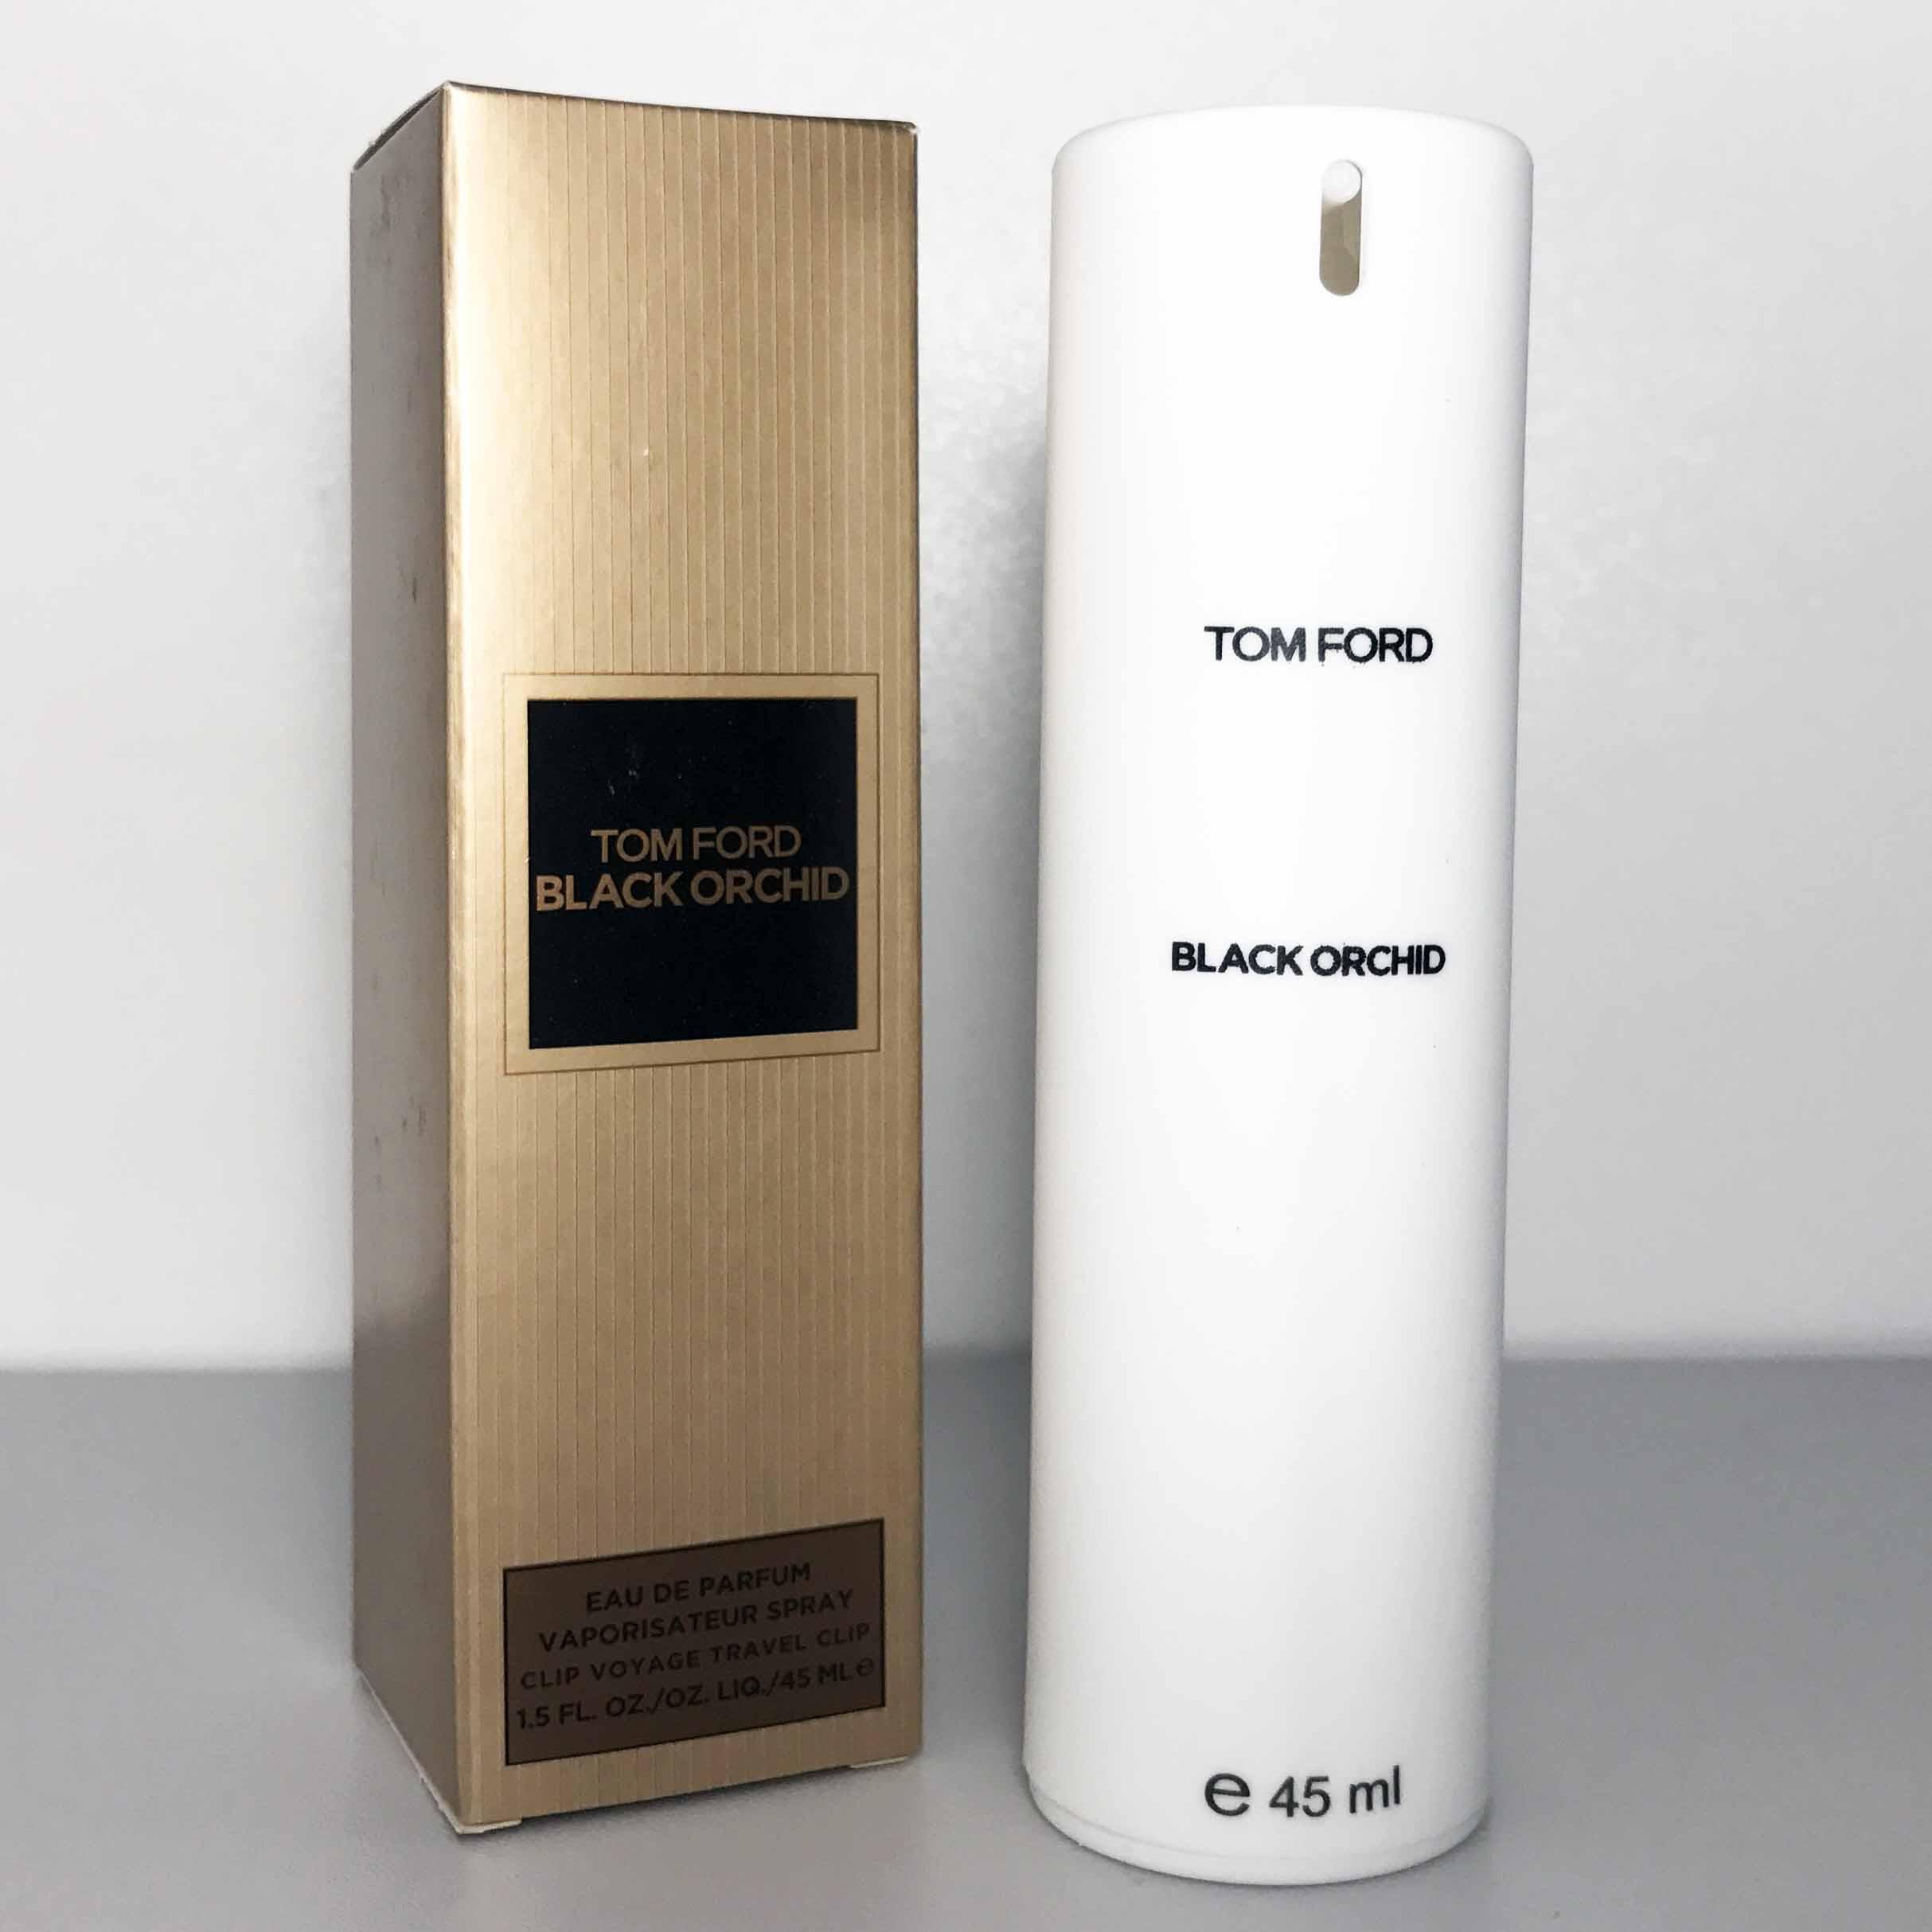 Tom Ford Black Orchid 45ml Gold Parfum